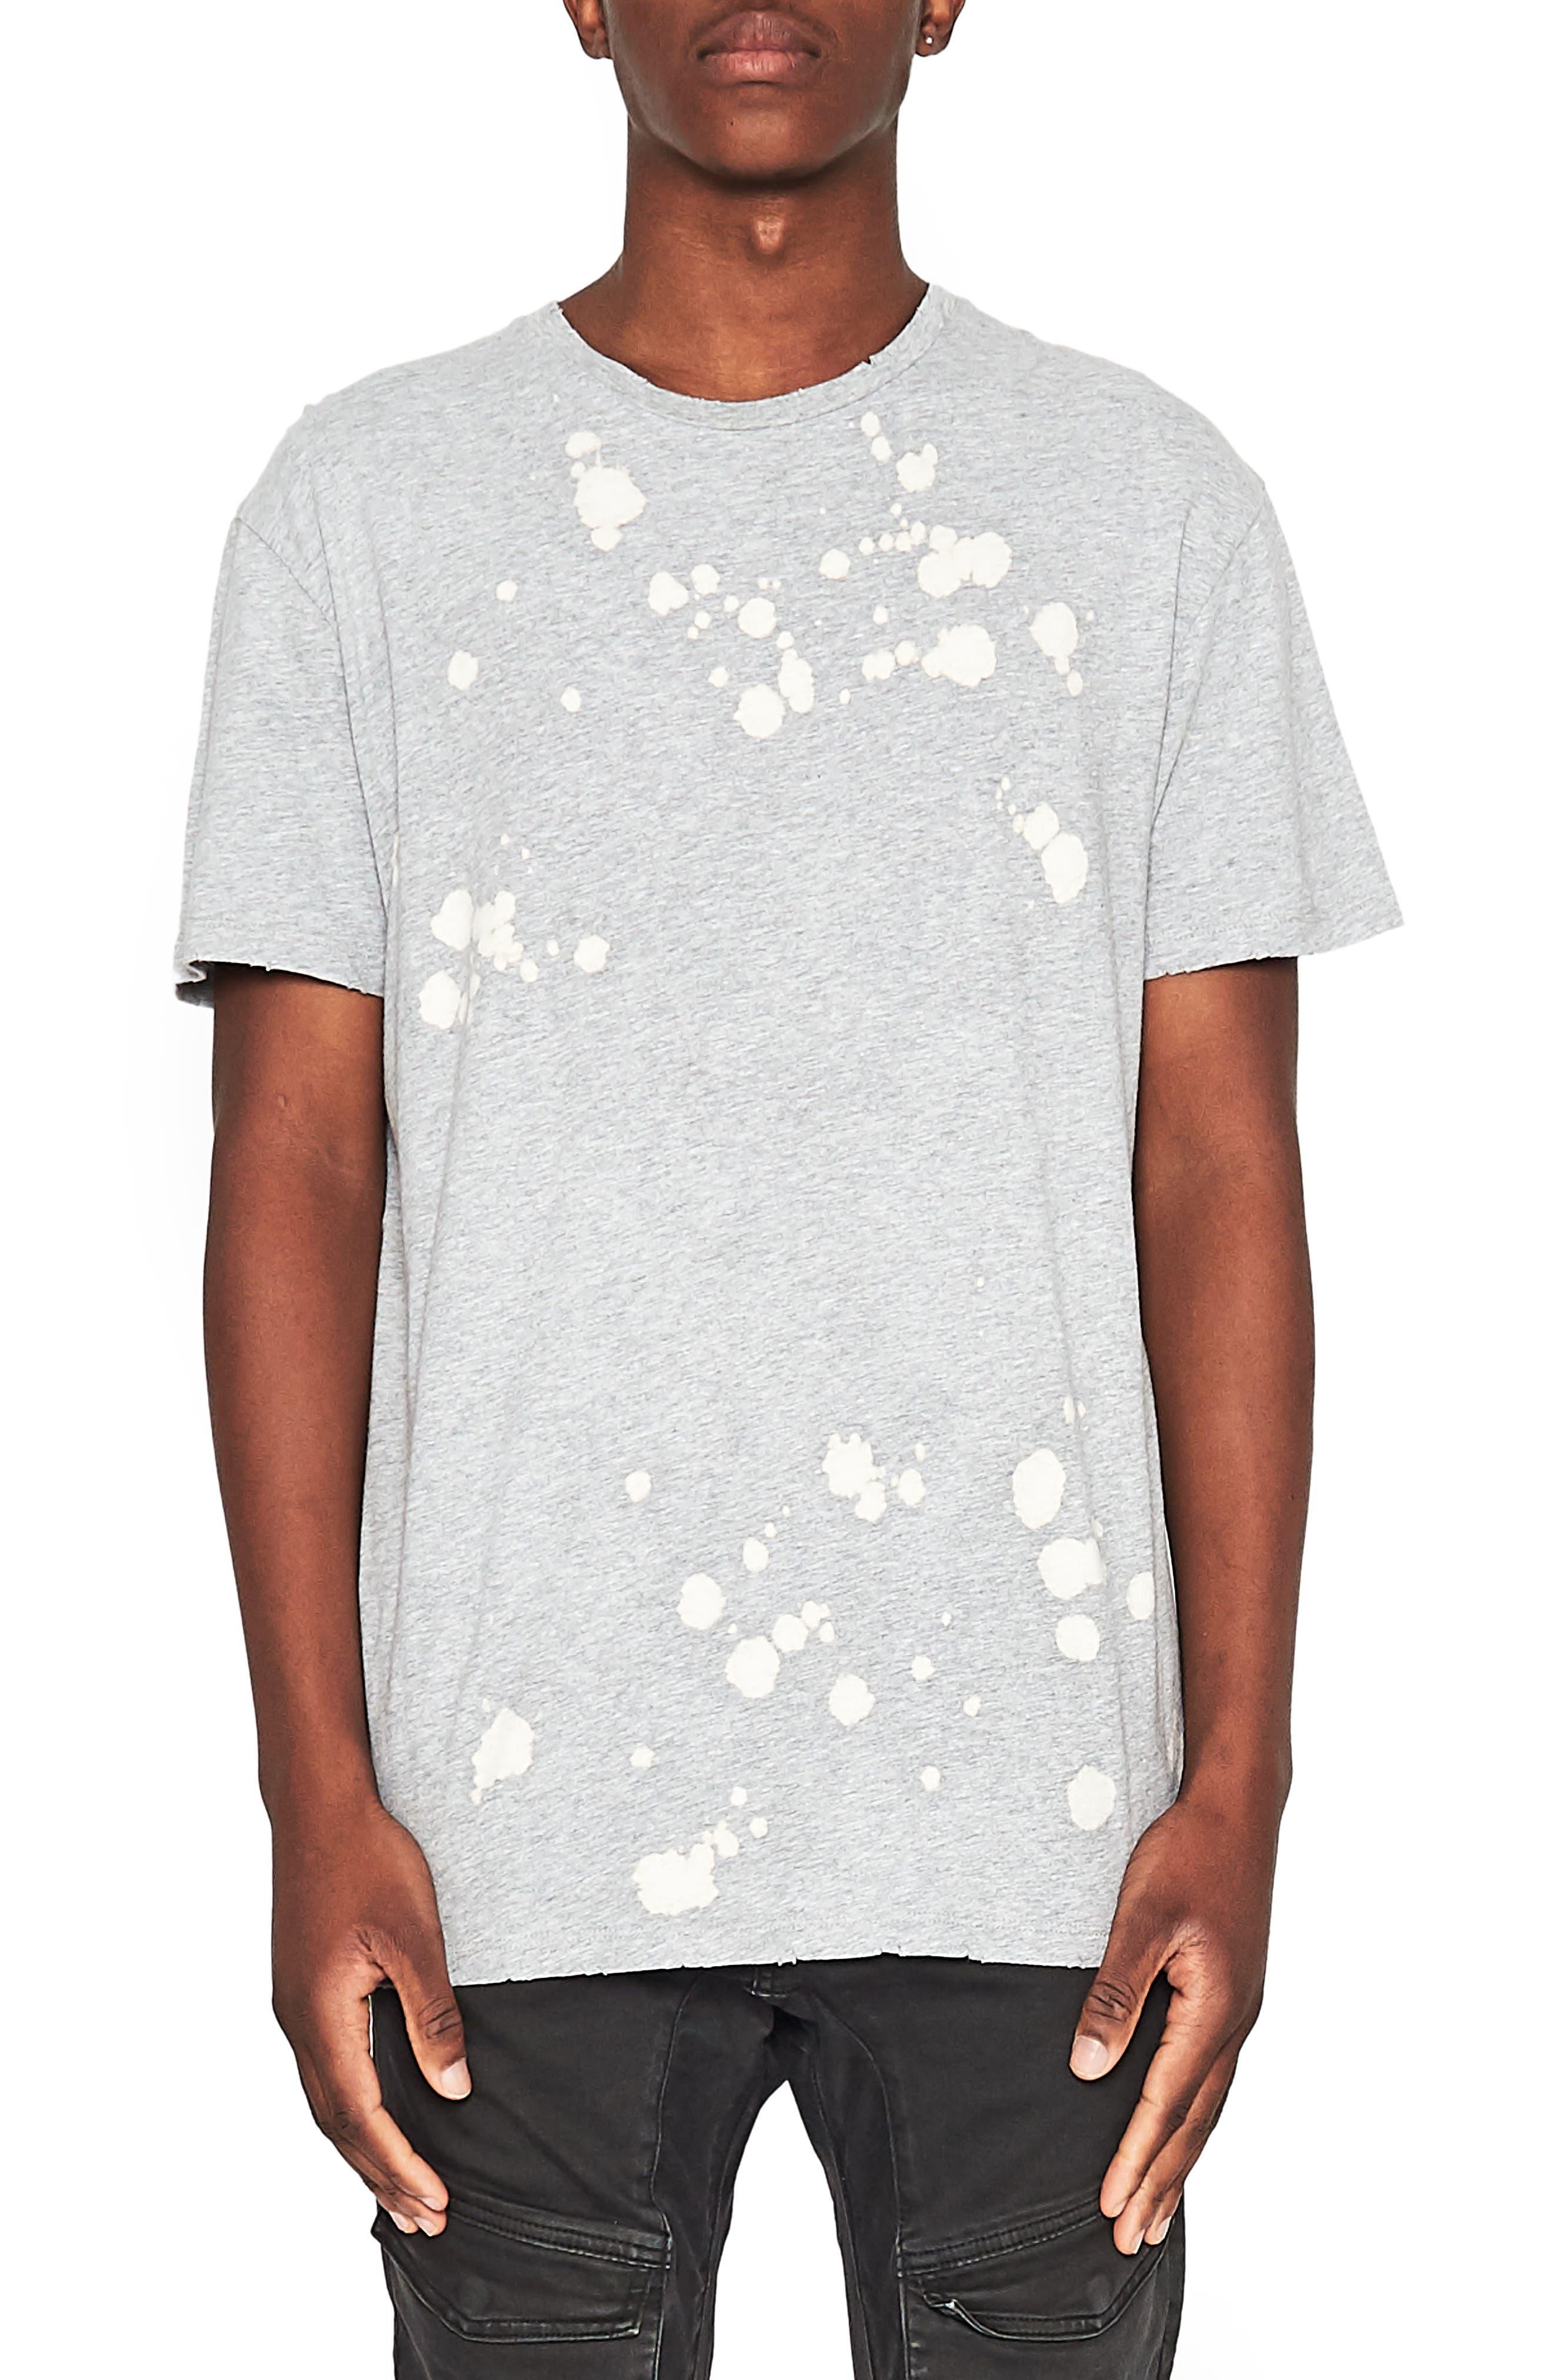 Da Vinci T-Shirt,                             Main thumbnail 1, color,                             062